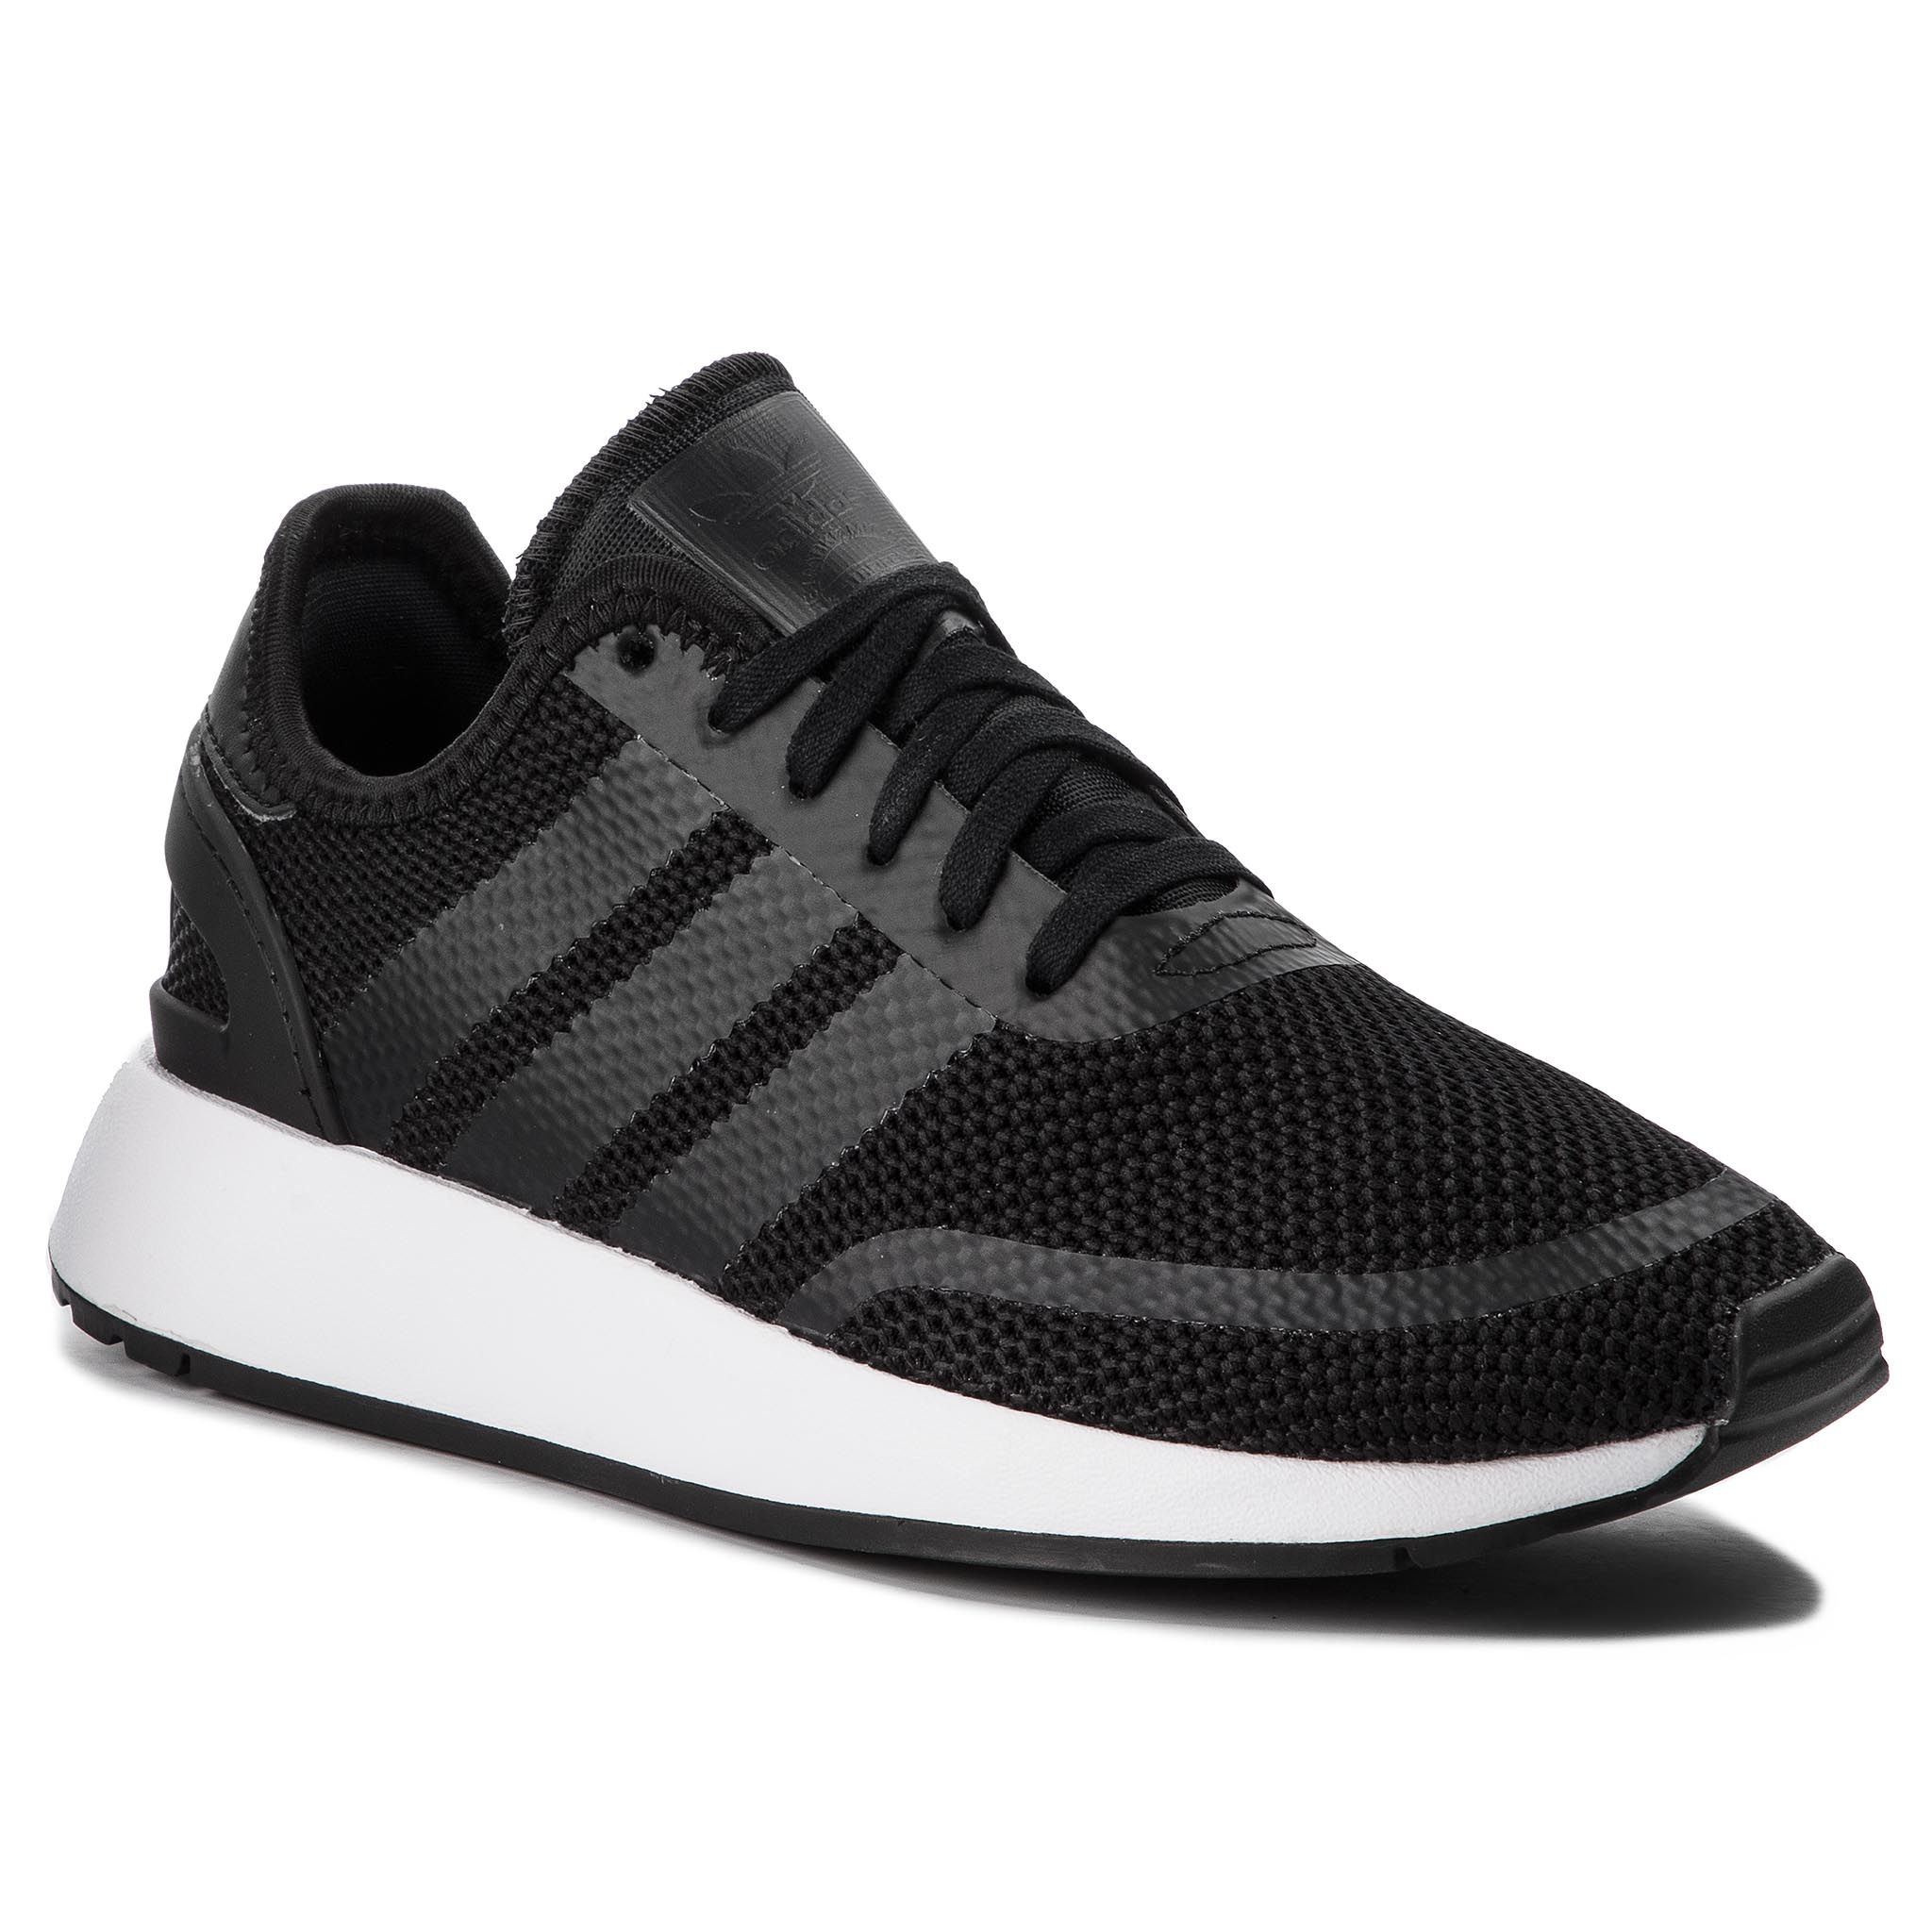 50a9b181c33c5 Shoes adidas - Zx Flux Adv Verve W BB2284 Cblack Cblack Ftwwht ...